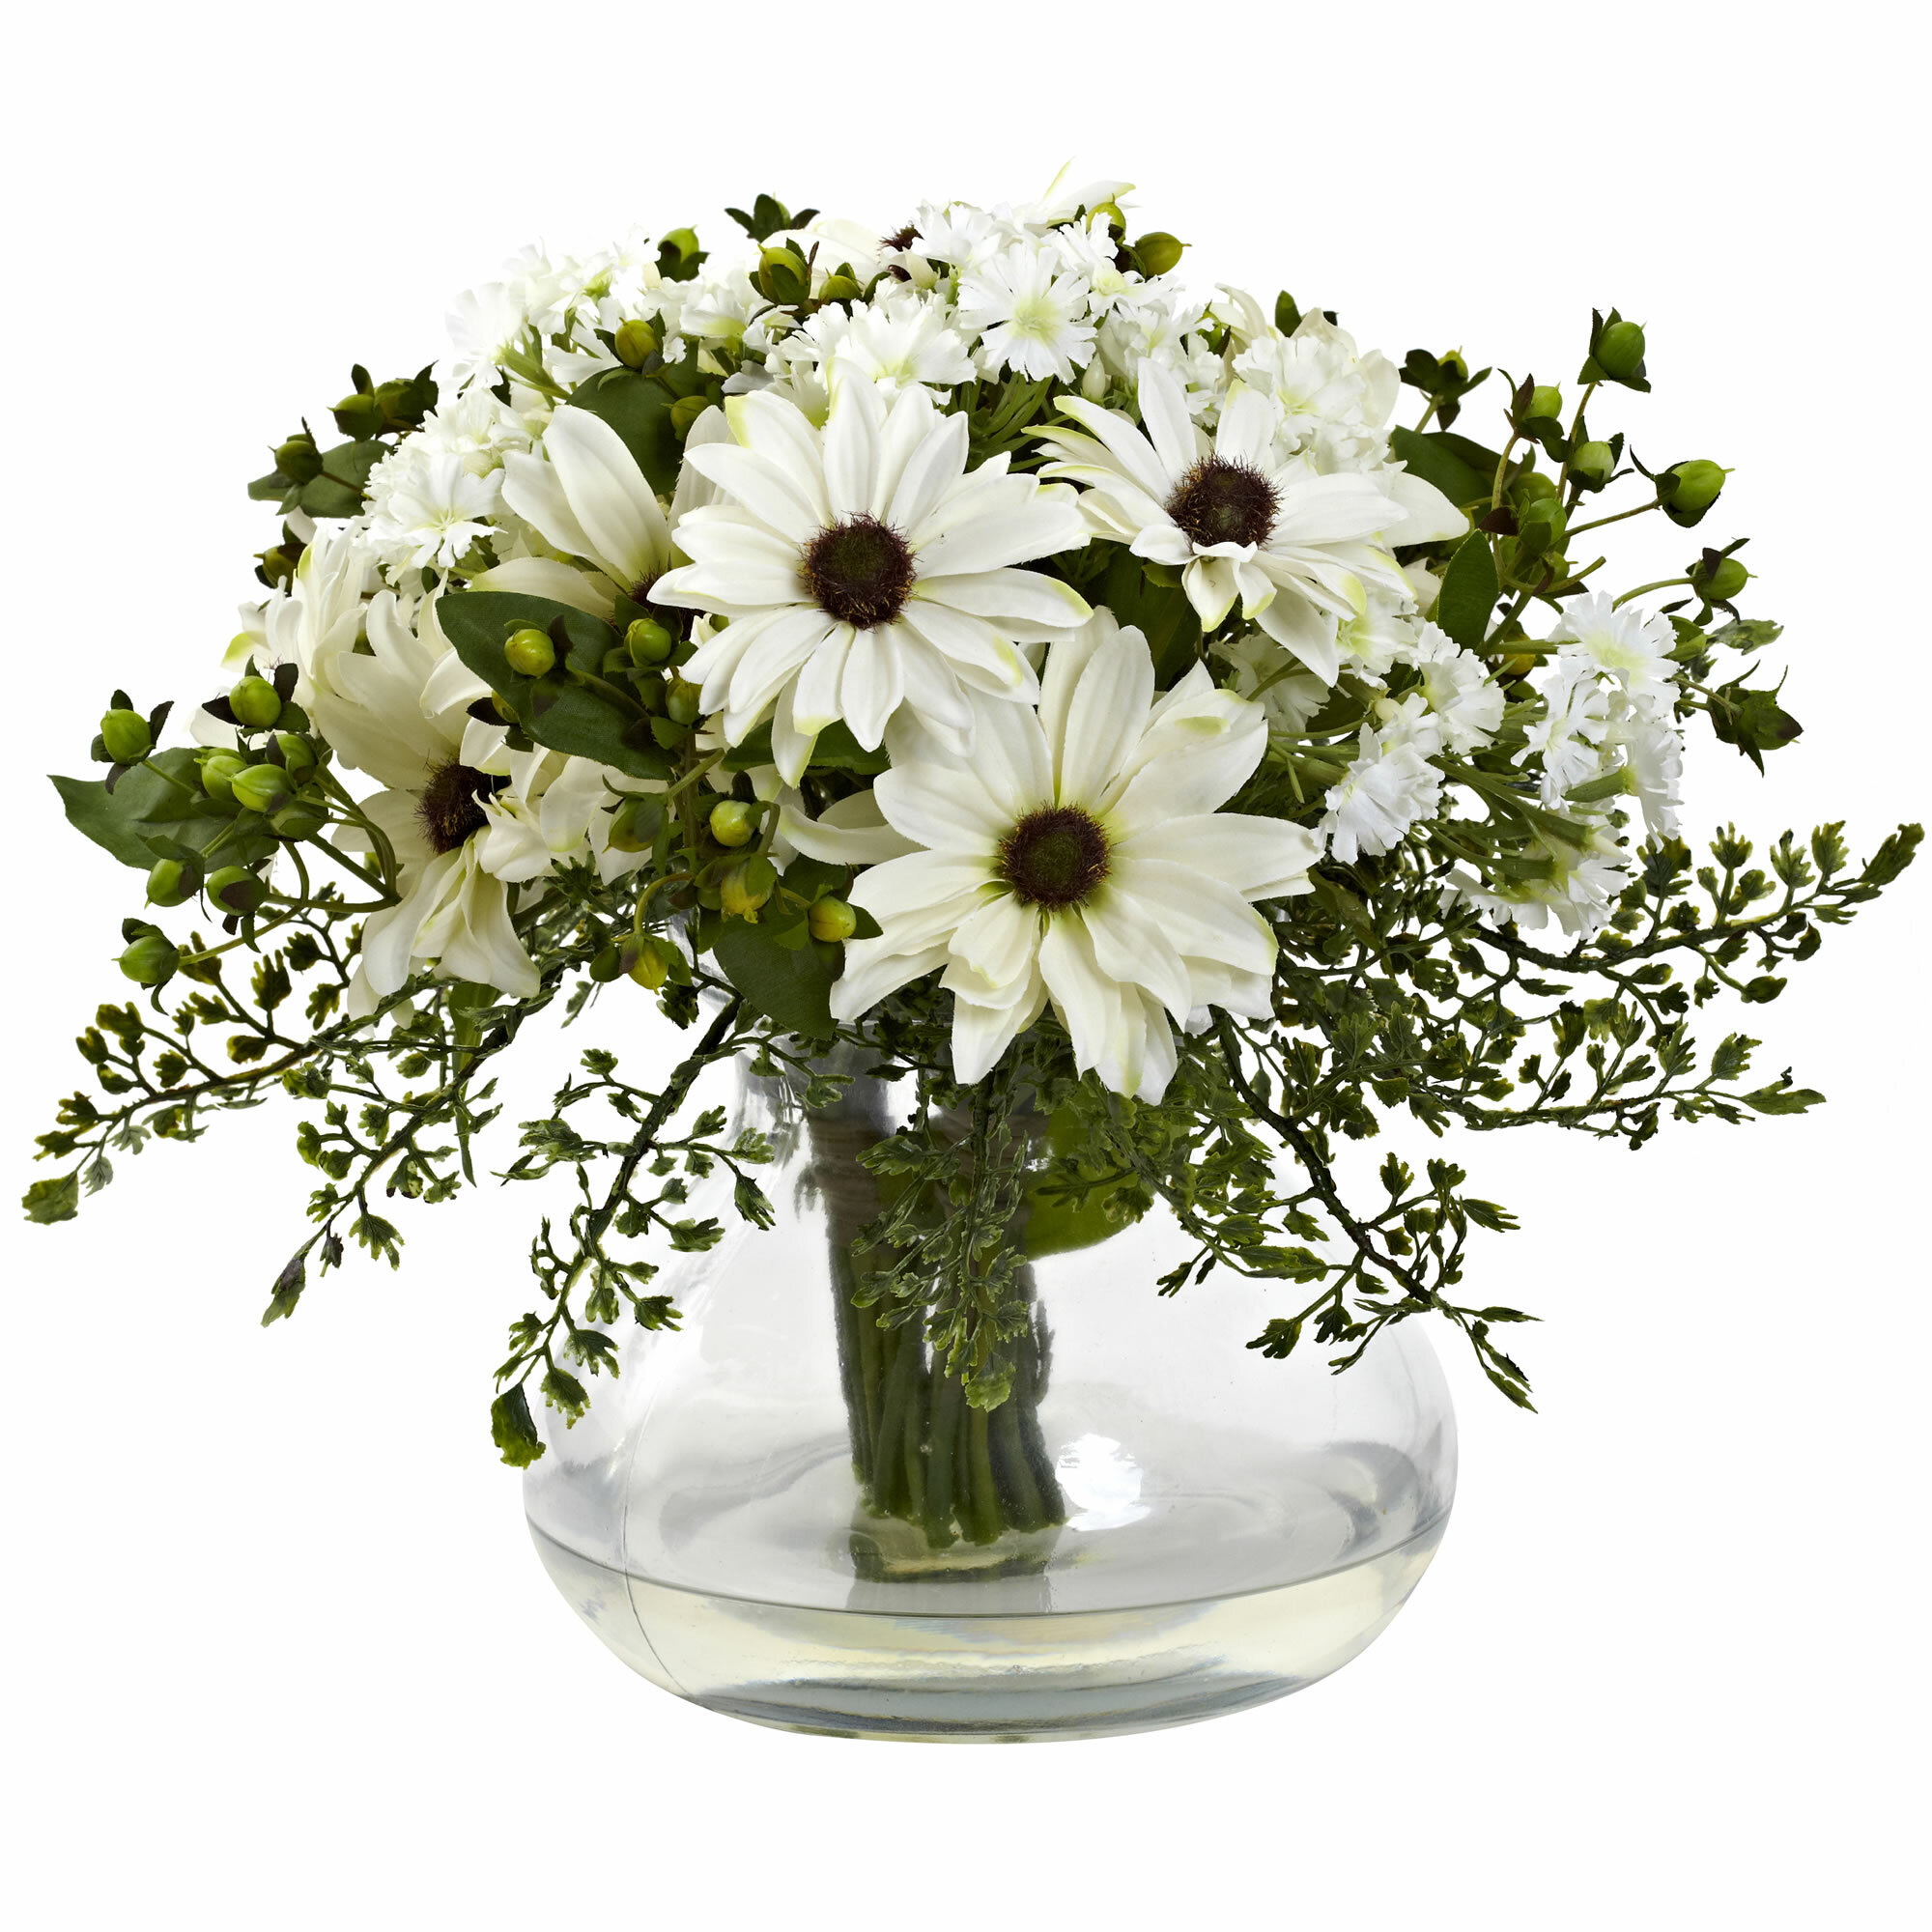 Mixed Daisy Floral Arrangement In Vase Reviews Joss Main